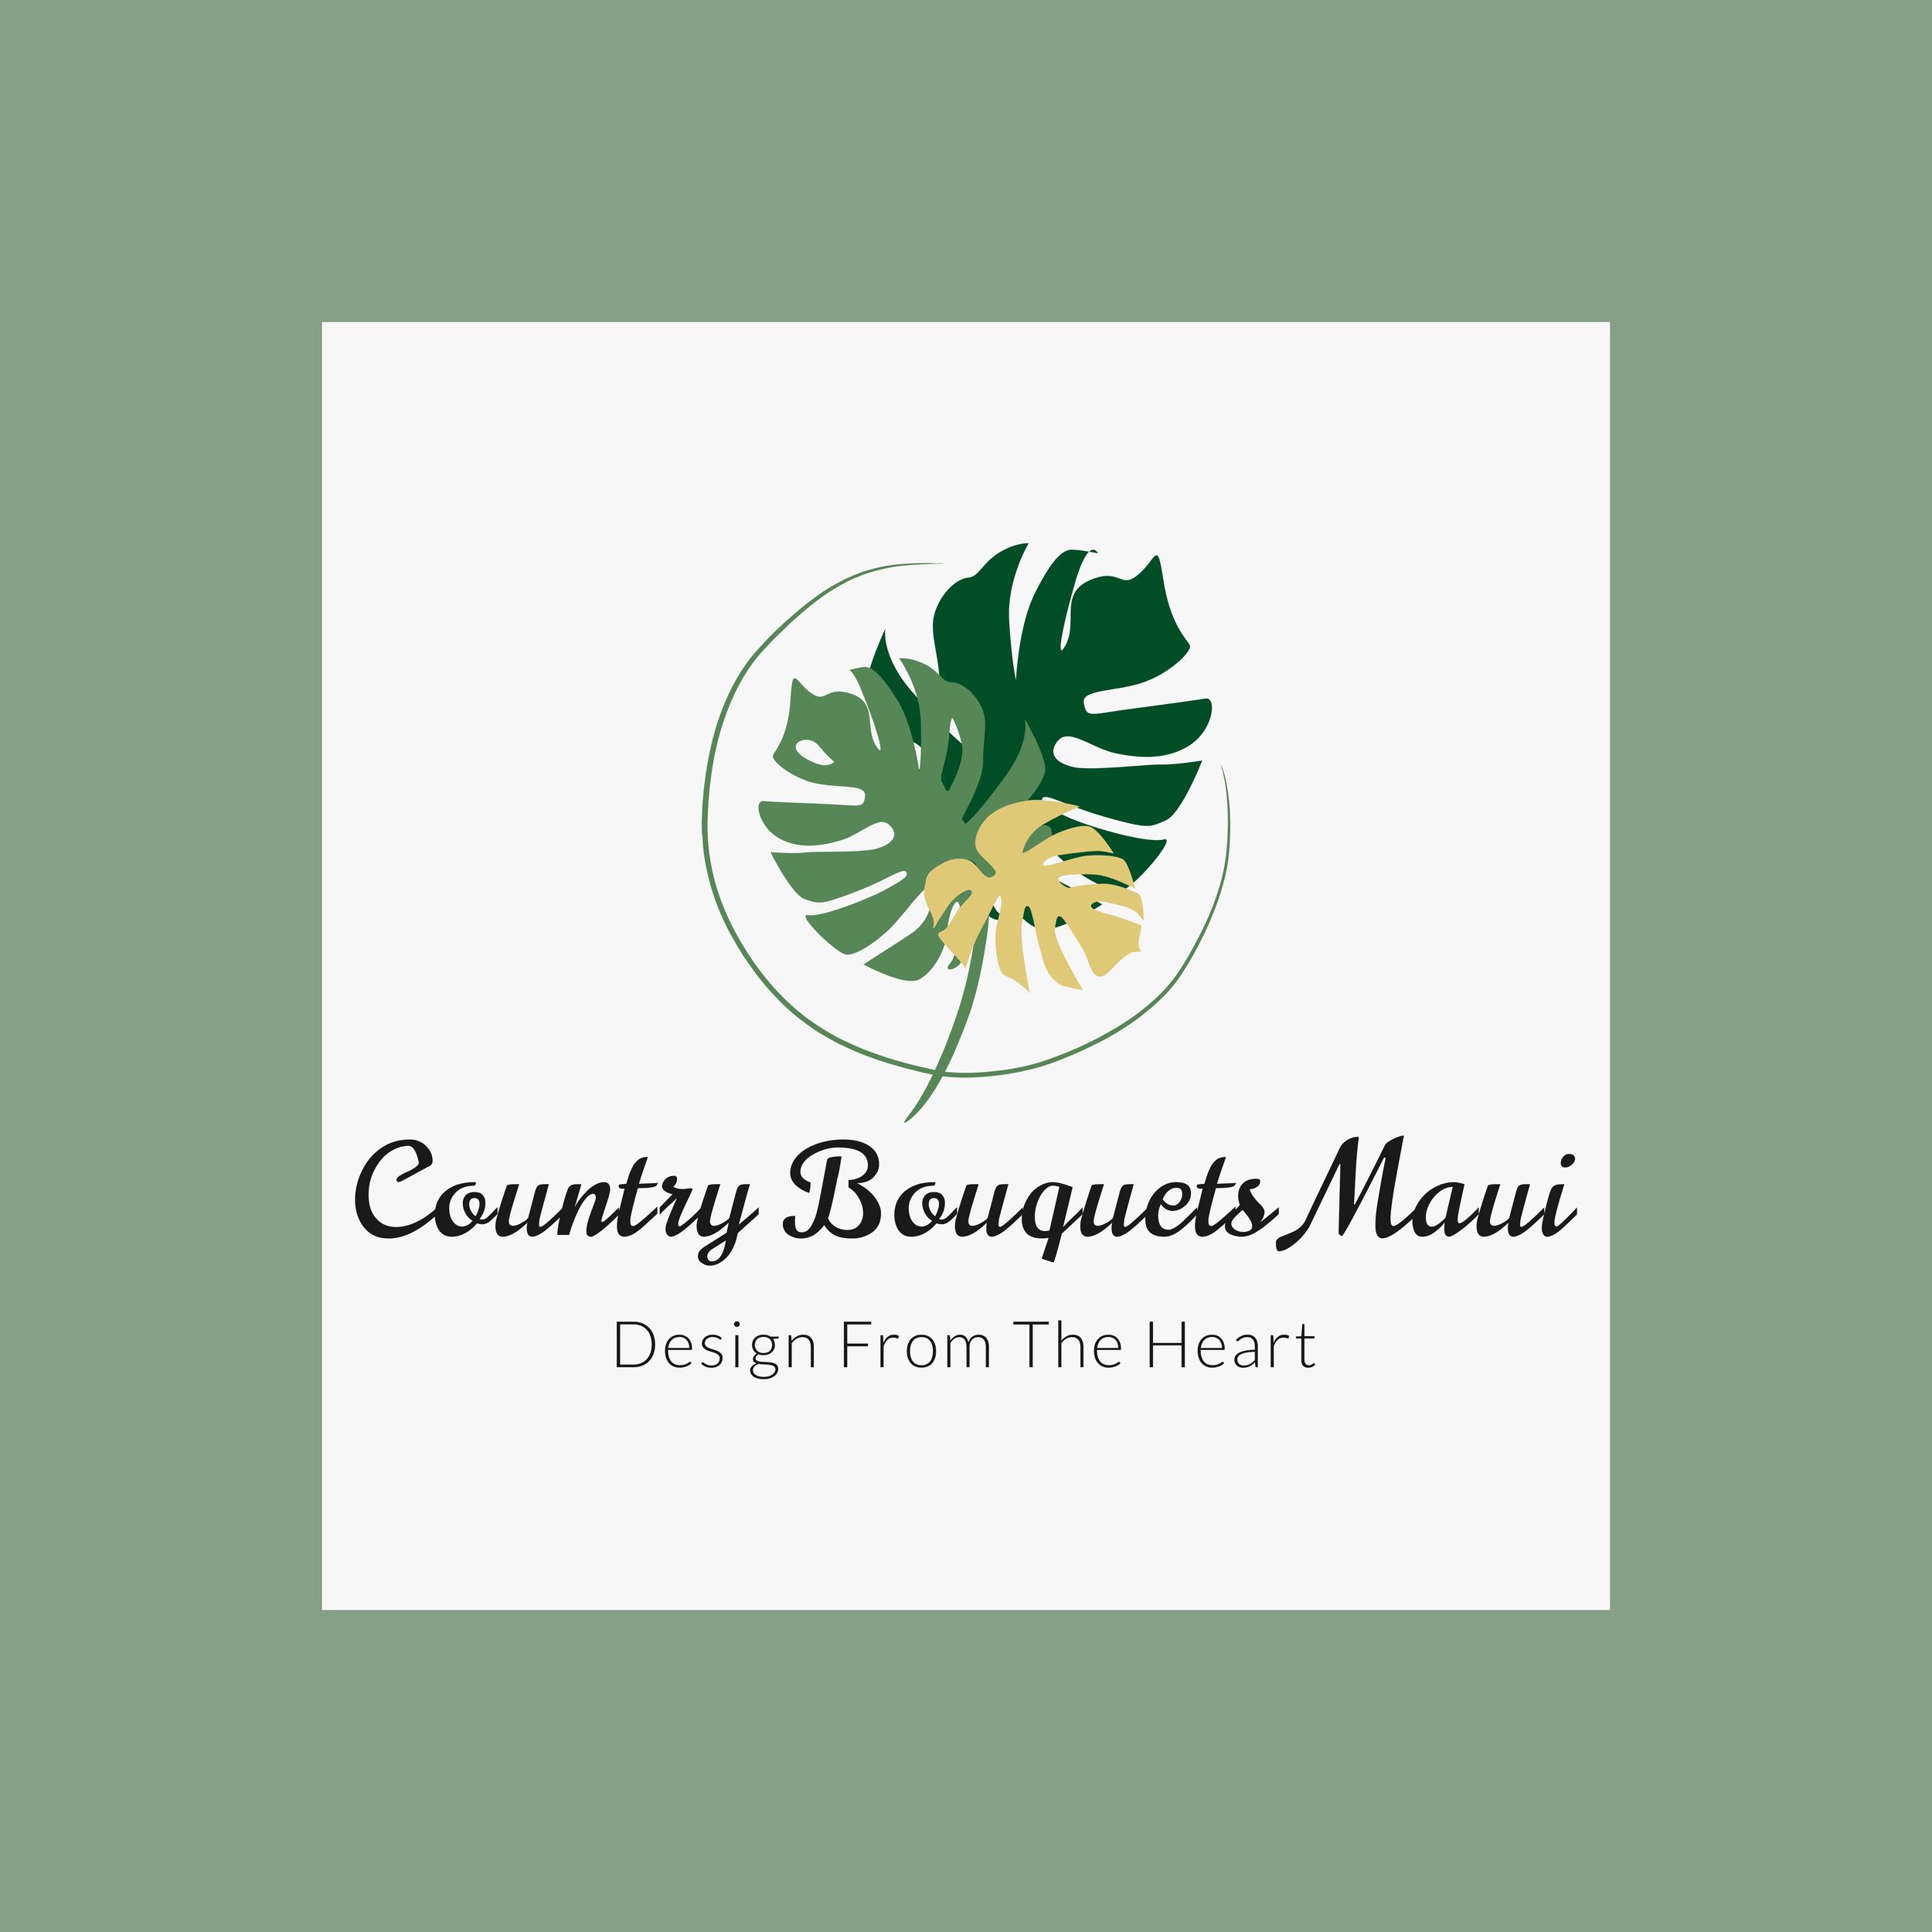 Country Bouquets-Florist logo